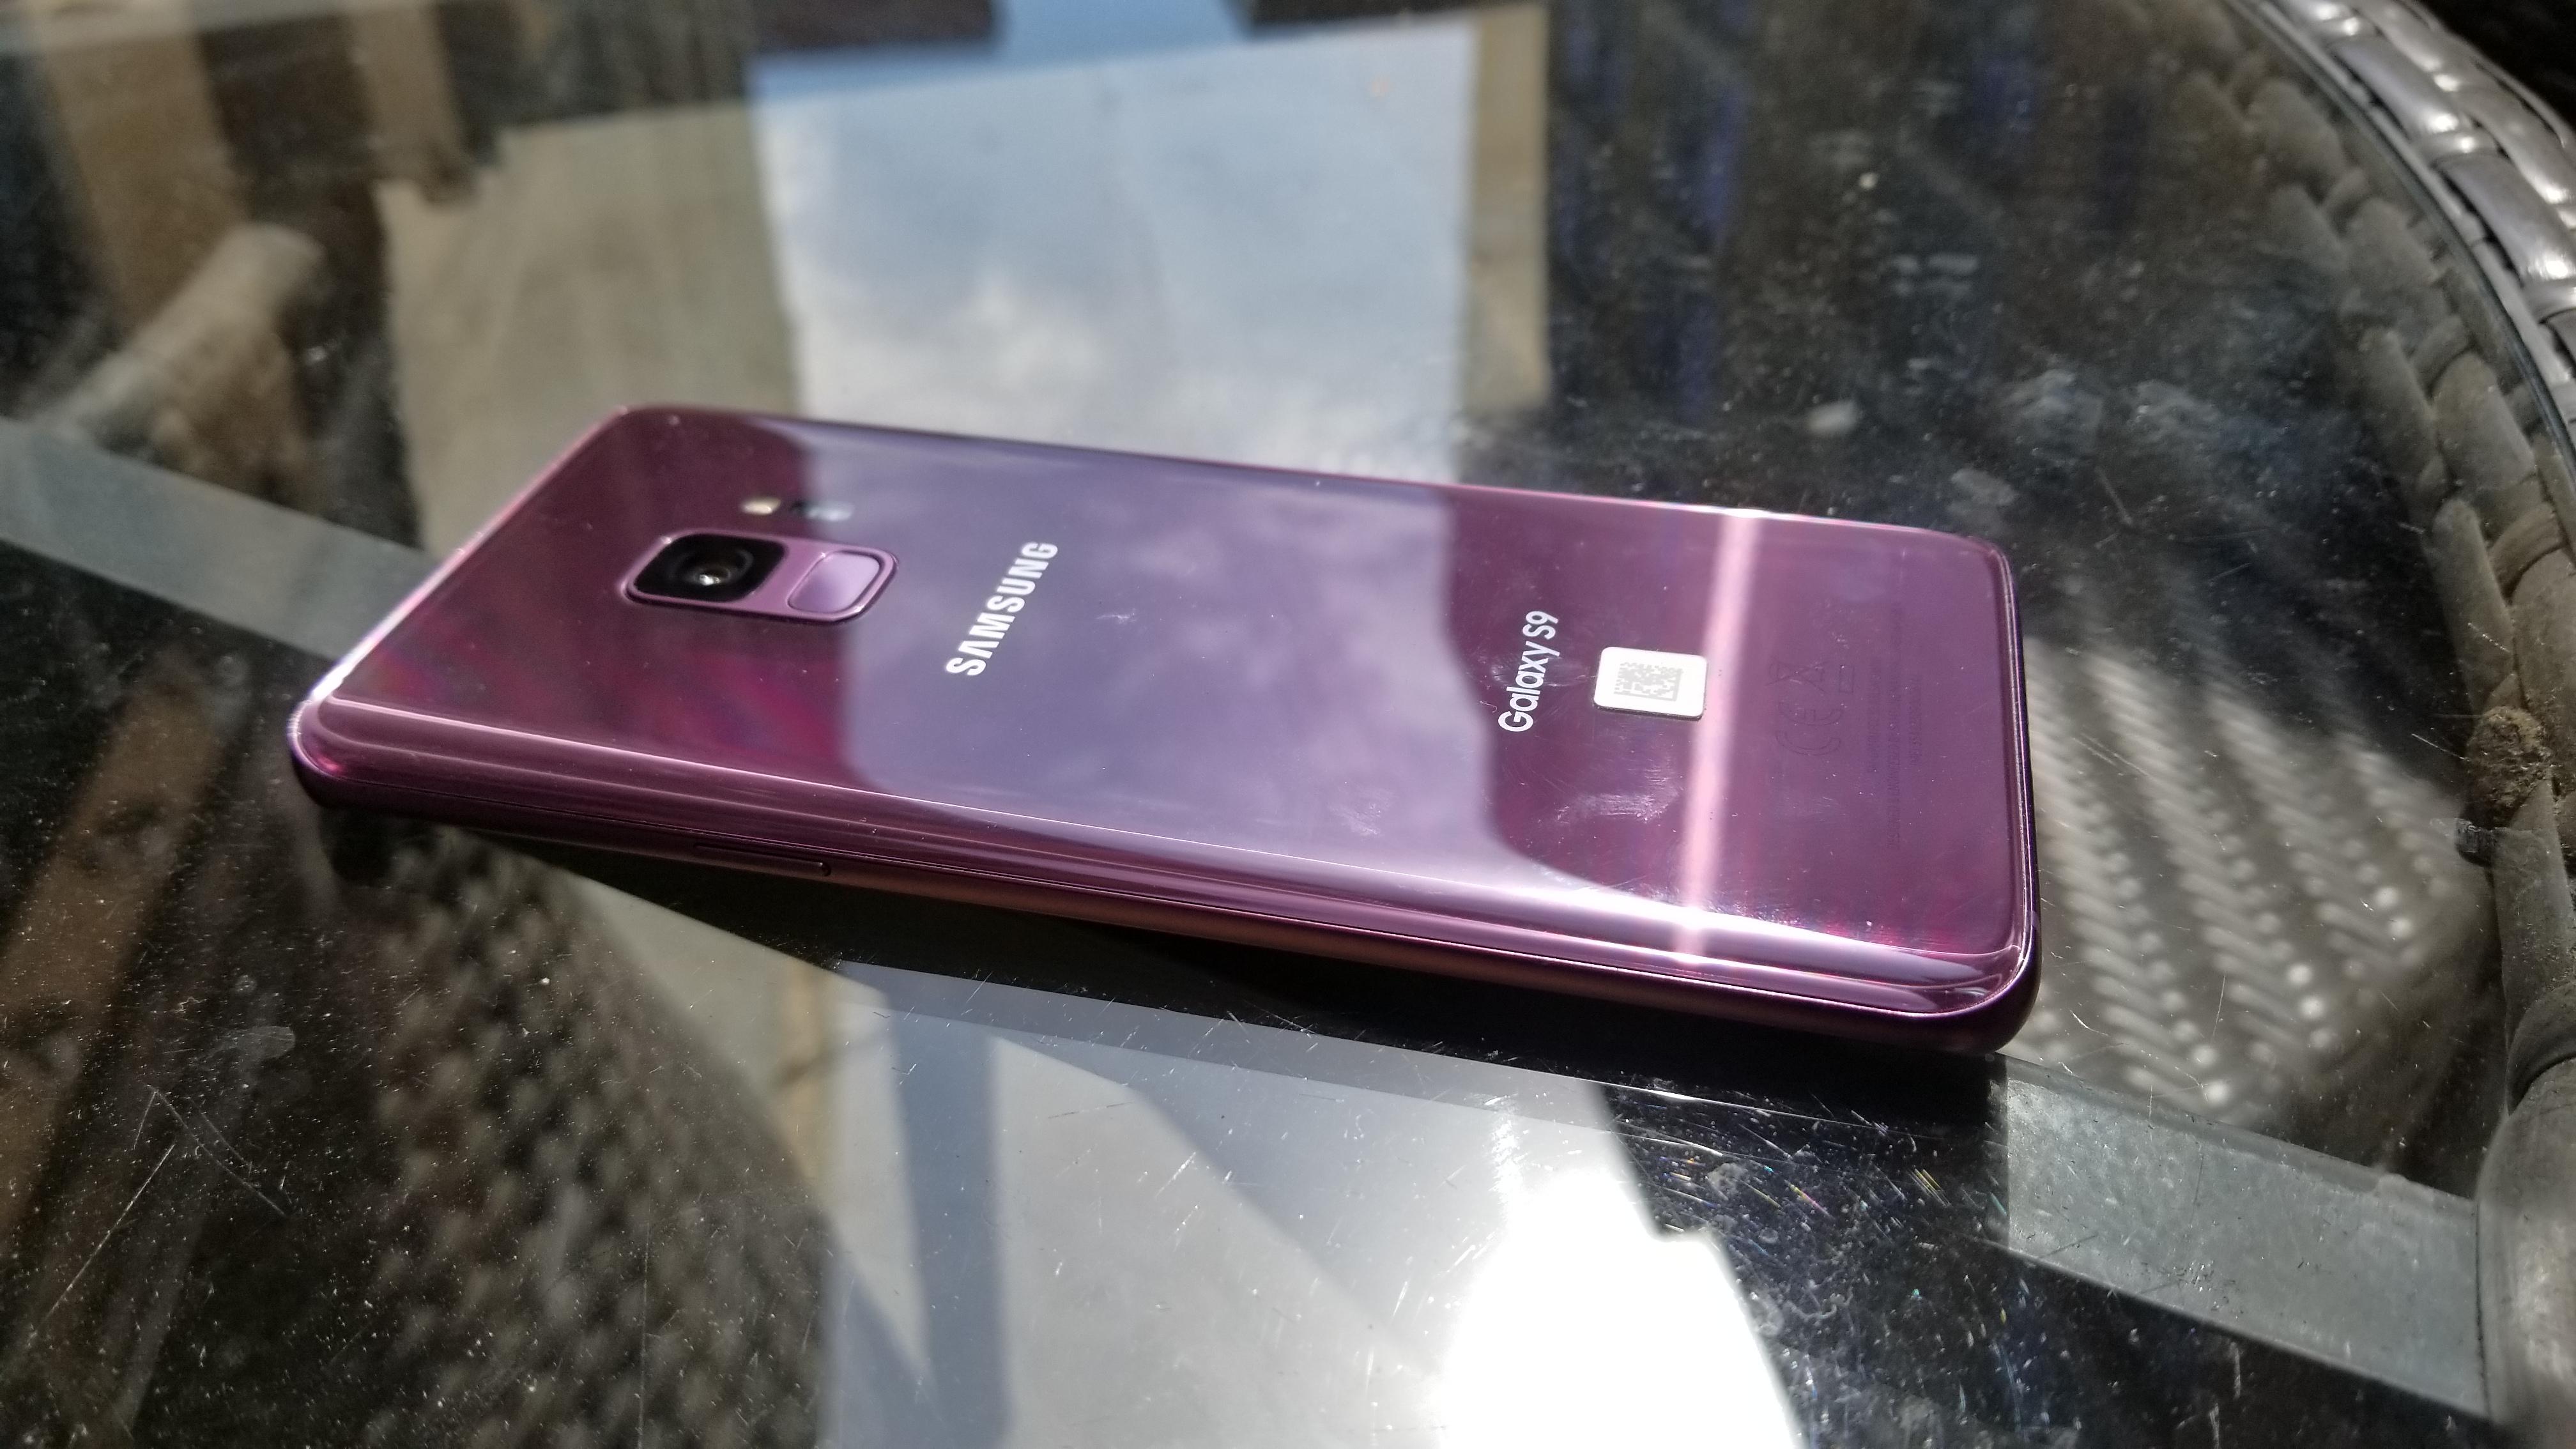 Samsung Galaxy S9 Review on Verizon: How Galaxy Got its